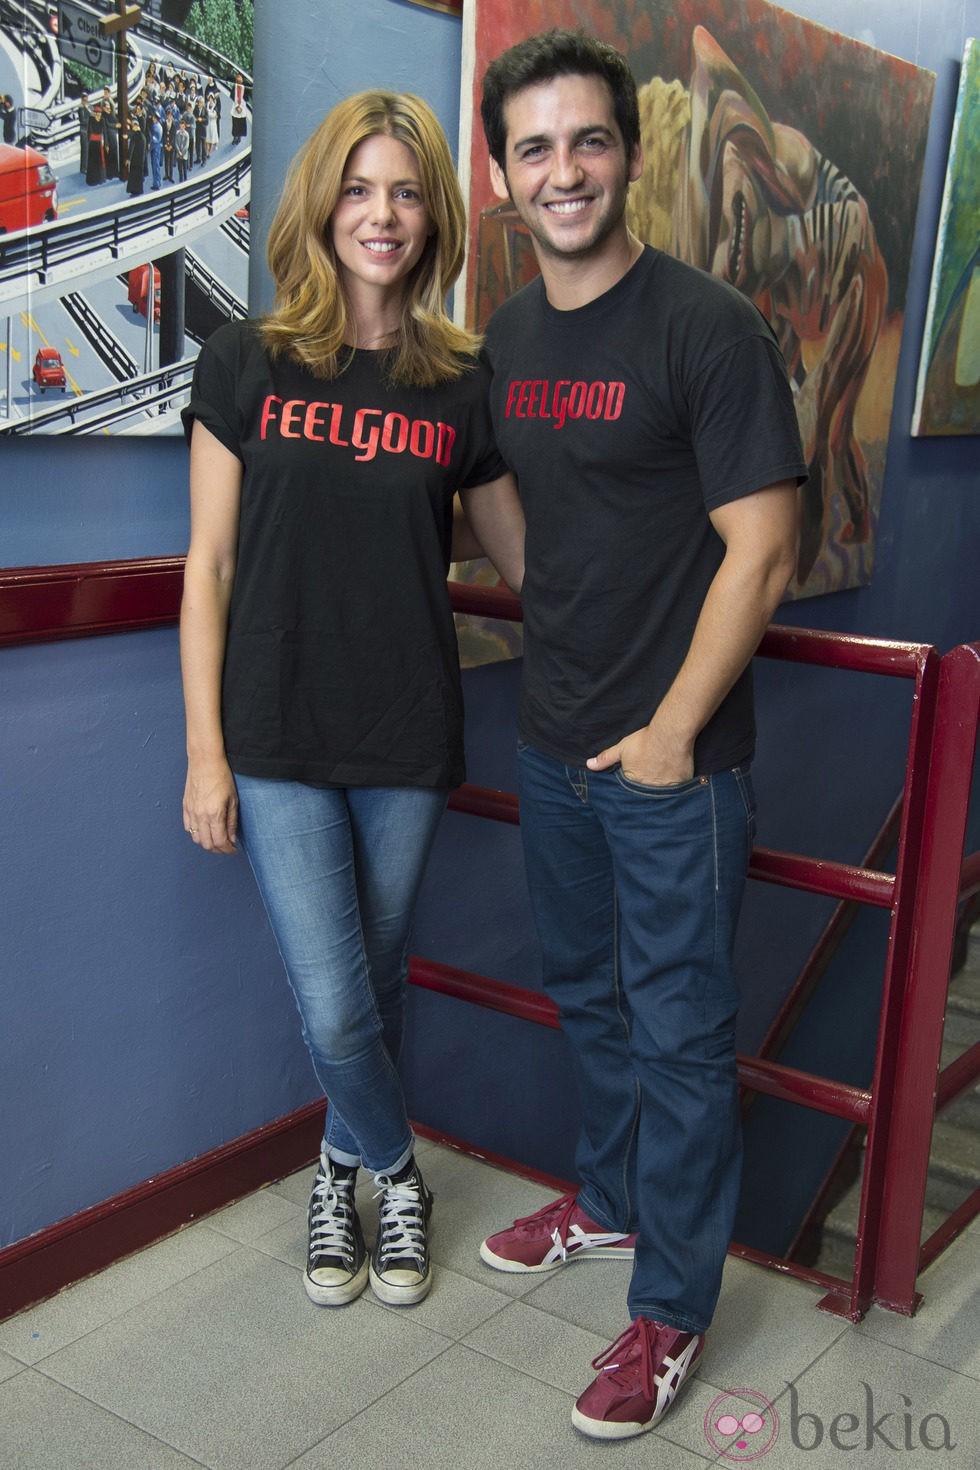 Fran Perea y Manuela Velasco protagonizan 'Feelgood'